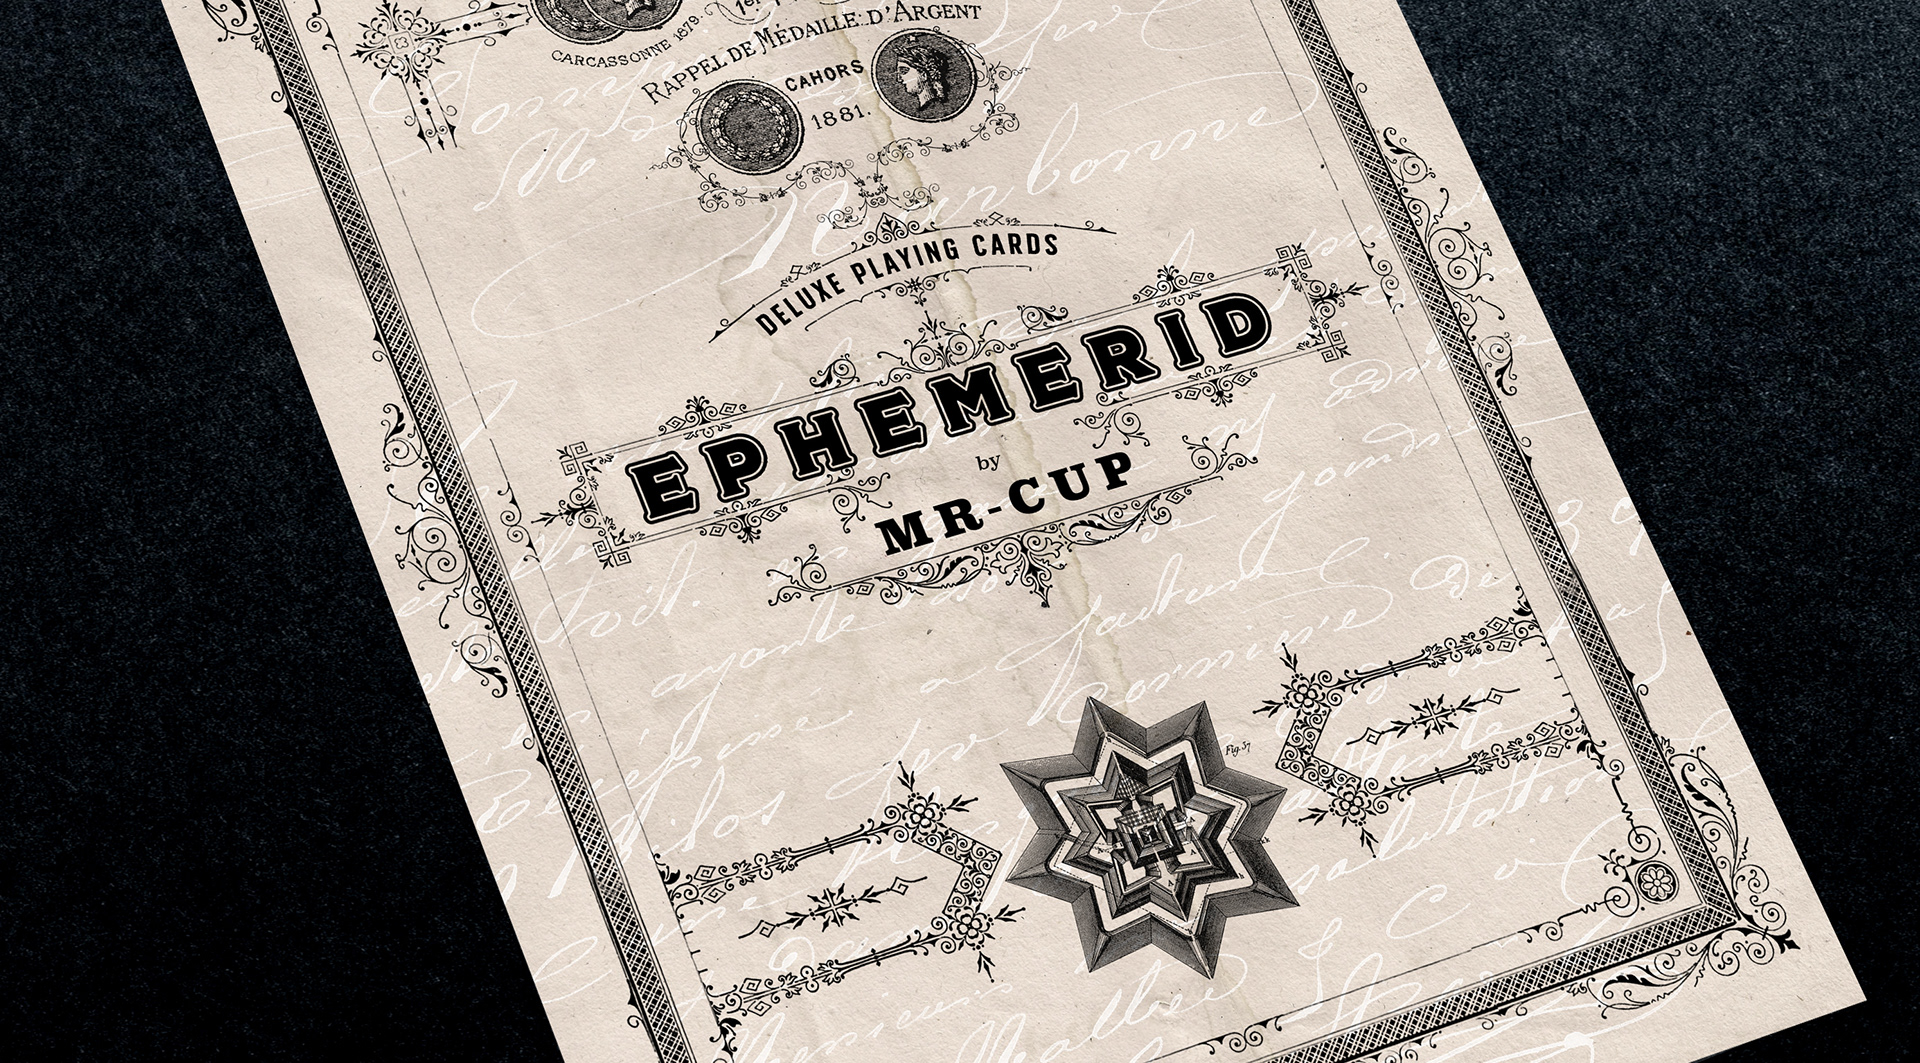 Ephemerid Playing Cards (Series 1) - PaperSpecs